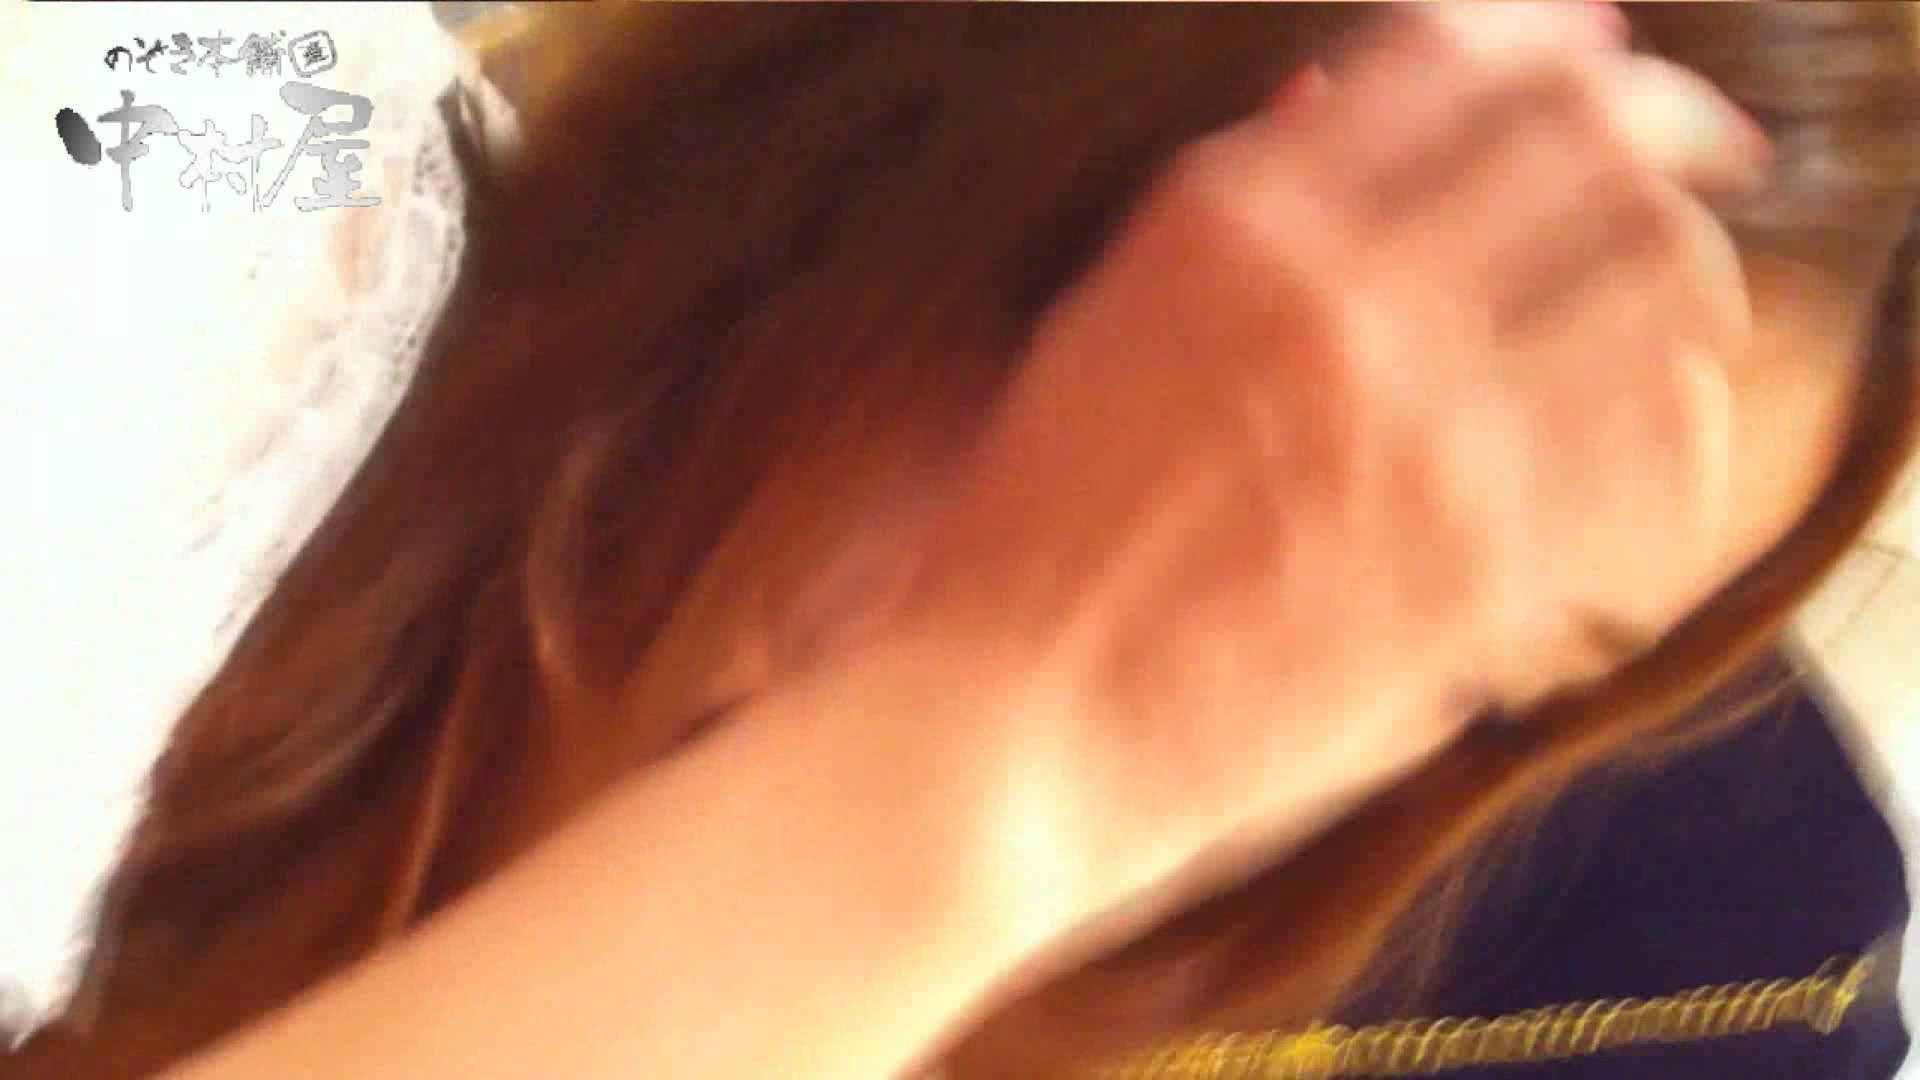 vol.62 美人アパレル胸チラ&パンチラ 笑顔のチャーミングなおねぃさん 胸チラ  102PICs 5